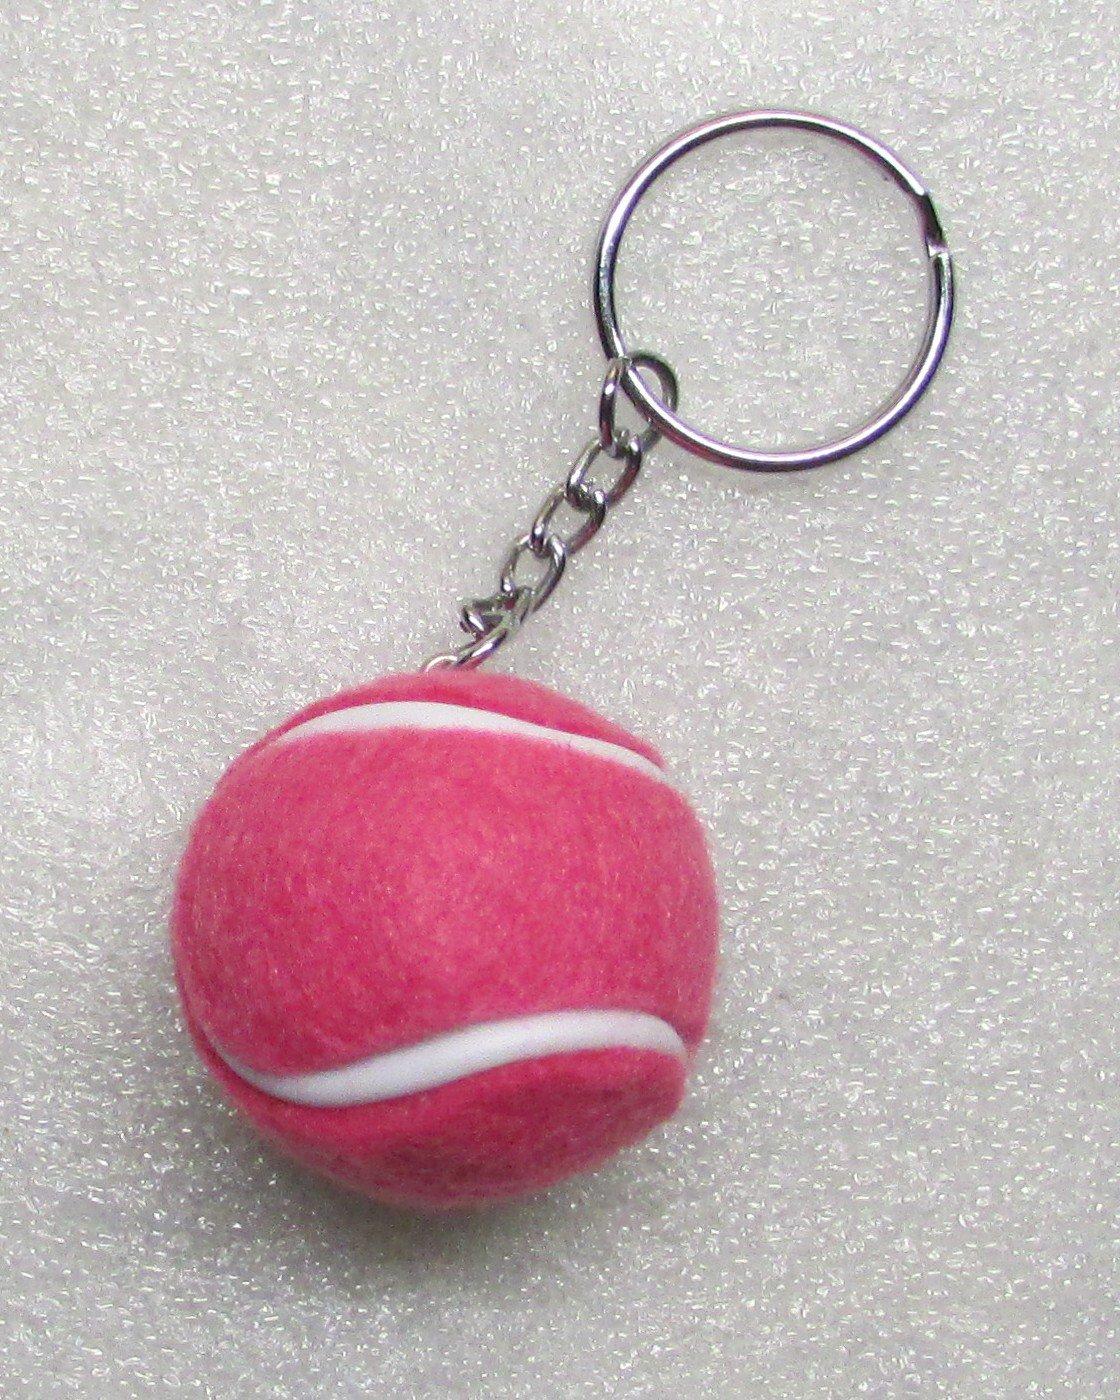 1.25 Inch Rose Red TENNIS BALL Plush KEY CHAIN Ring Keychain NEW